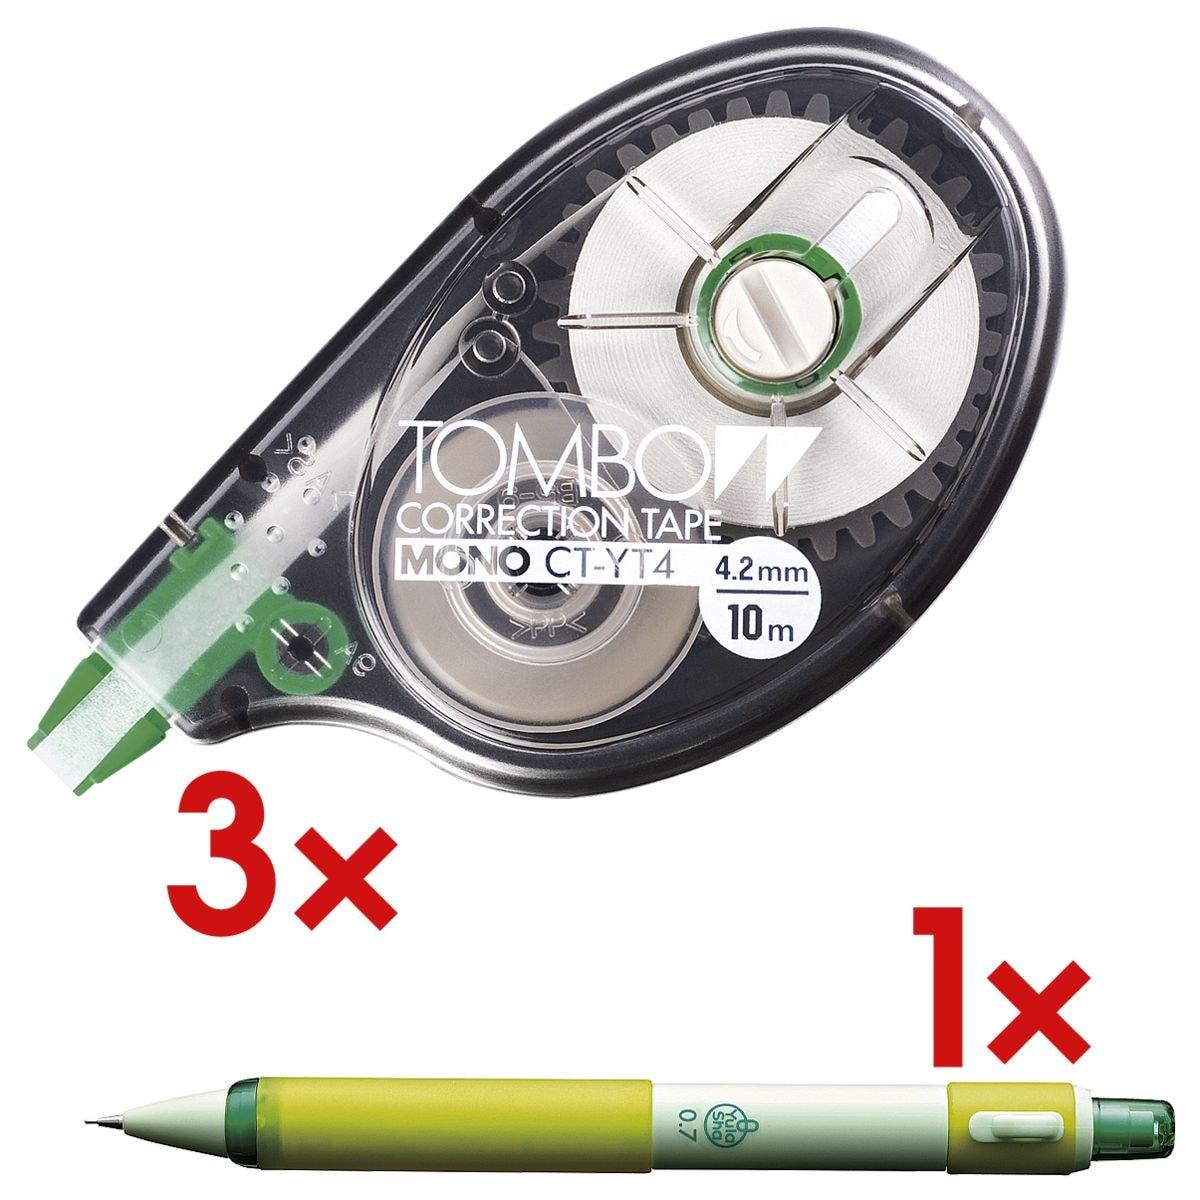 3x Tombow Einweg-Korrekturroller Mono, 4,2 mm / 10 m inkl. Druckbleistift »Yula-Sha« 0,7 mm HB